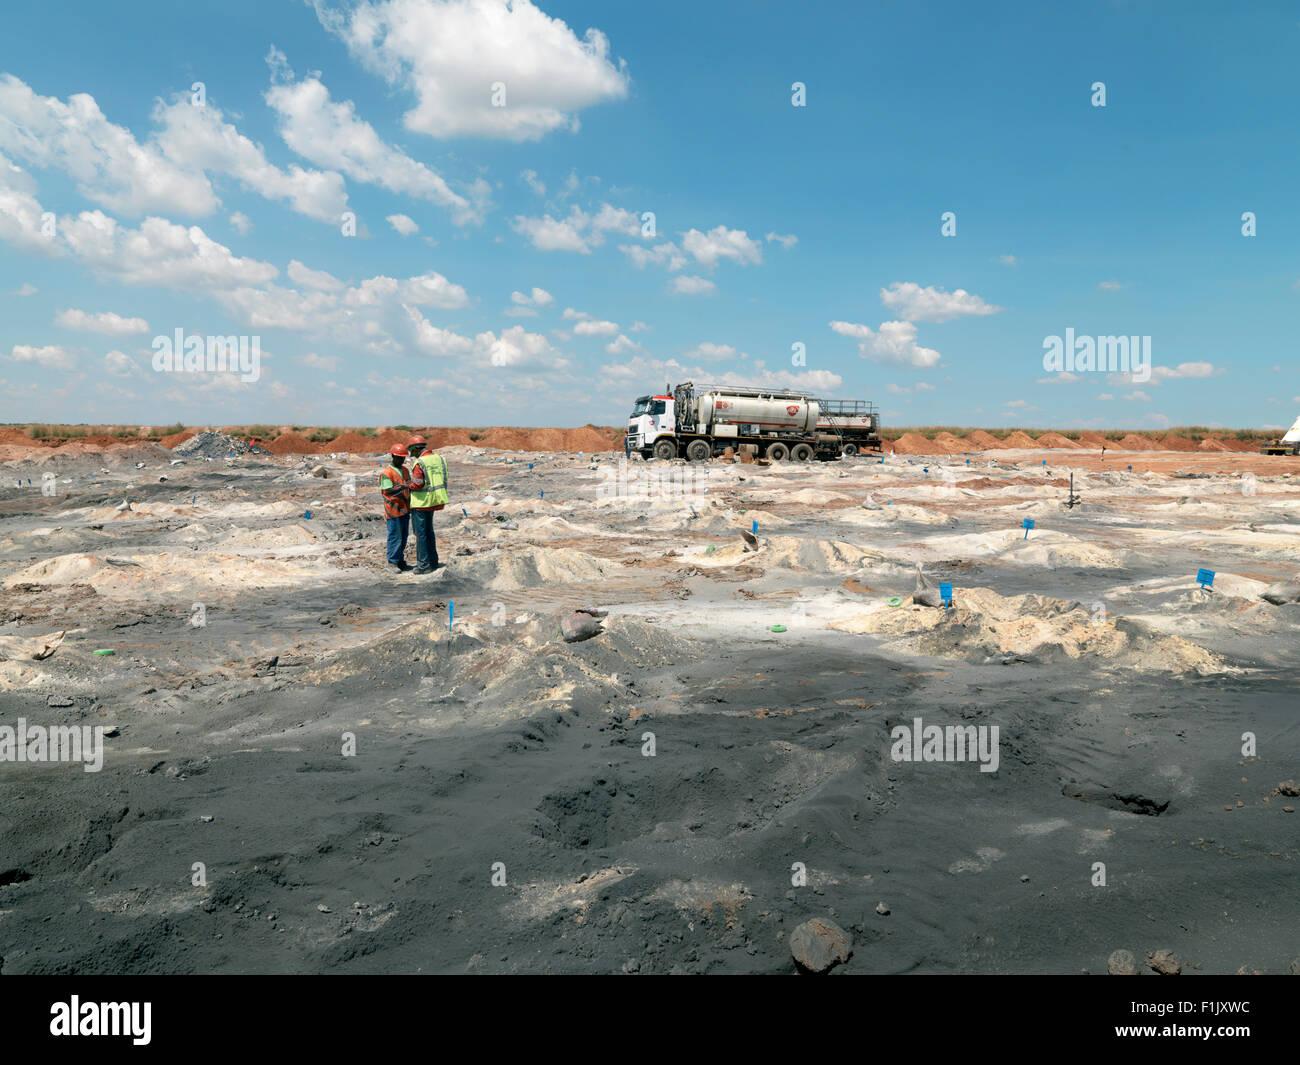 Pumping explosives for blasting, Palesa Coal Mine - Stock Image